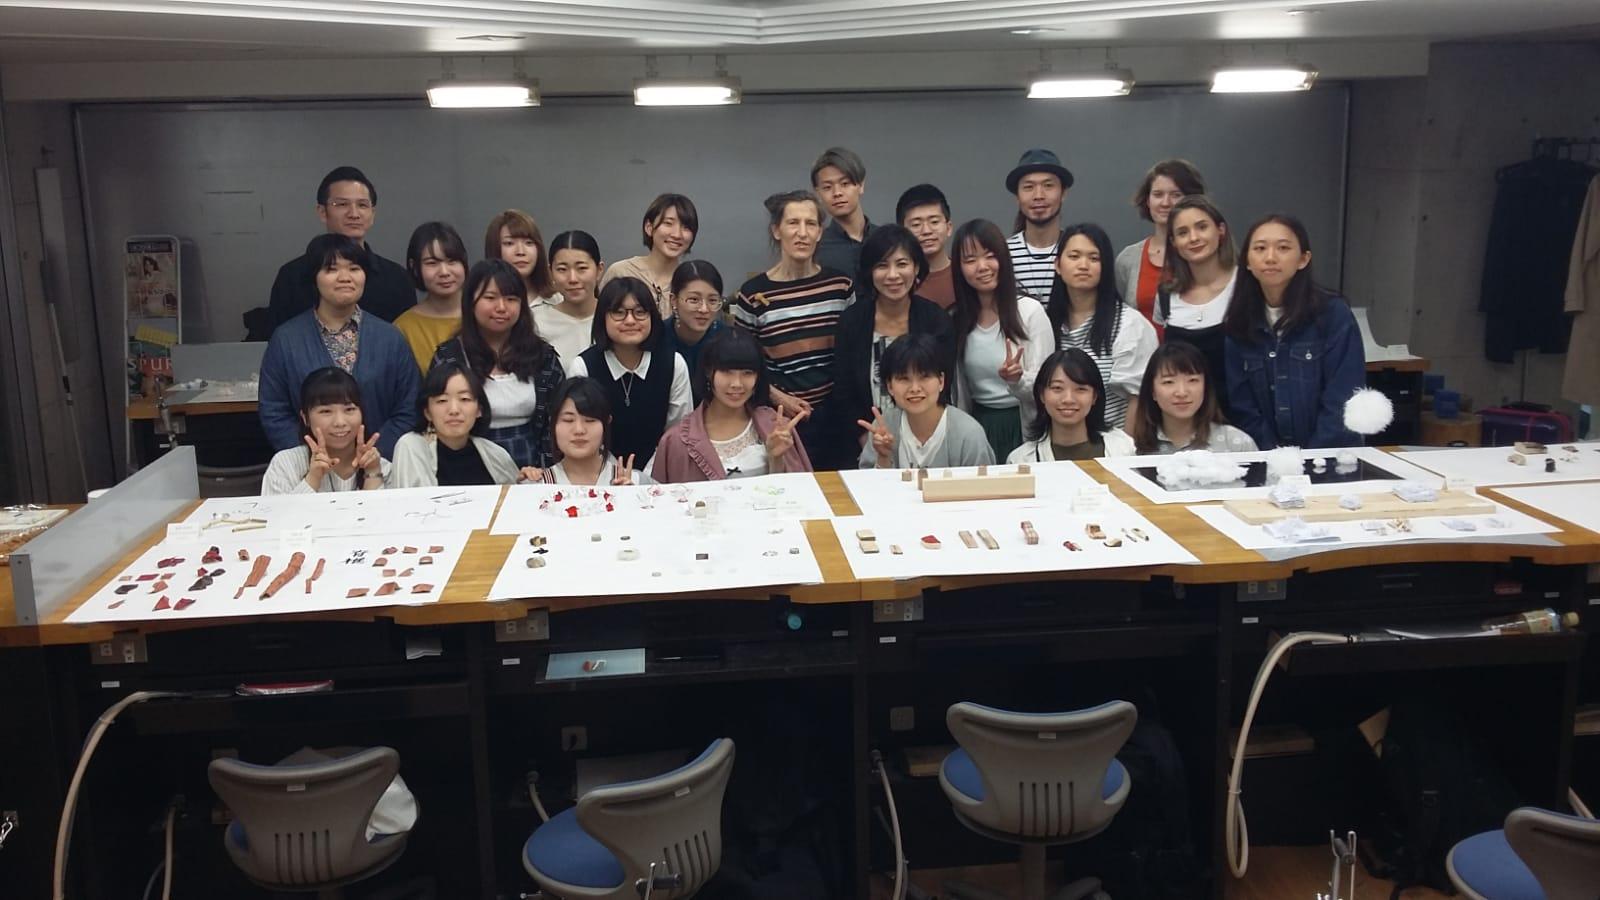 Hiko Mizuno College of Jewelry, Osaka, 2019. Foto Beppe Kessler, directeur Atsunori Murase